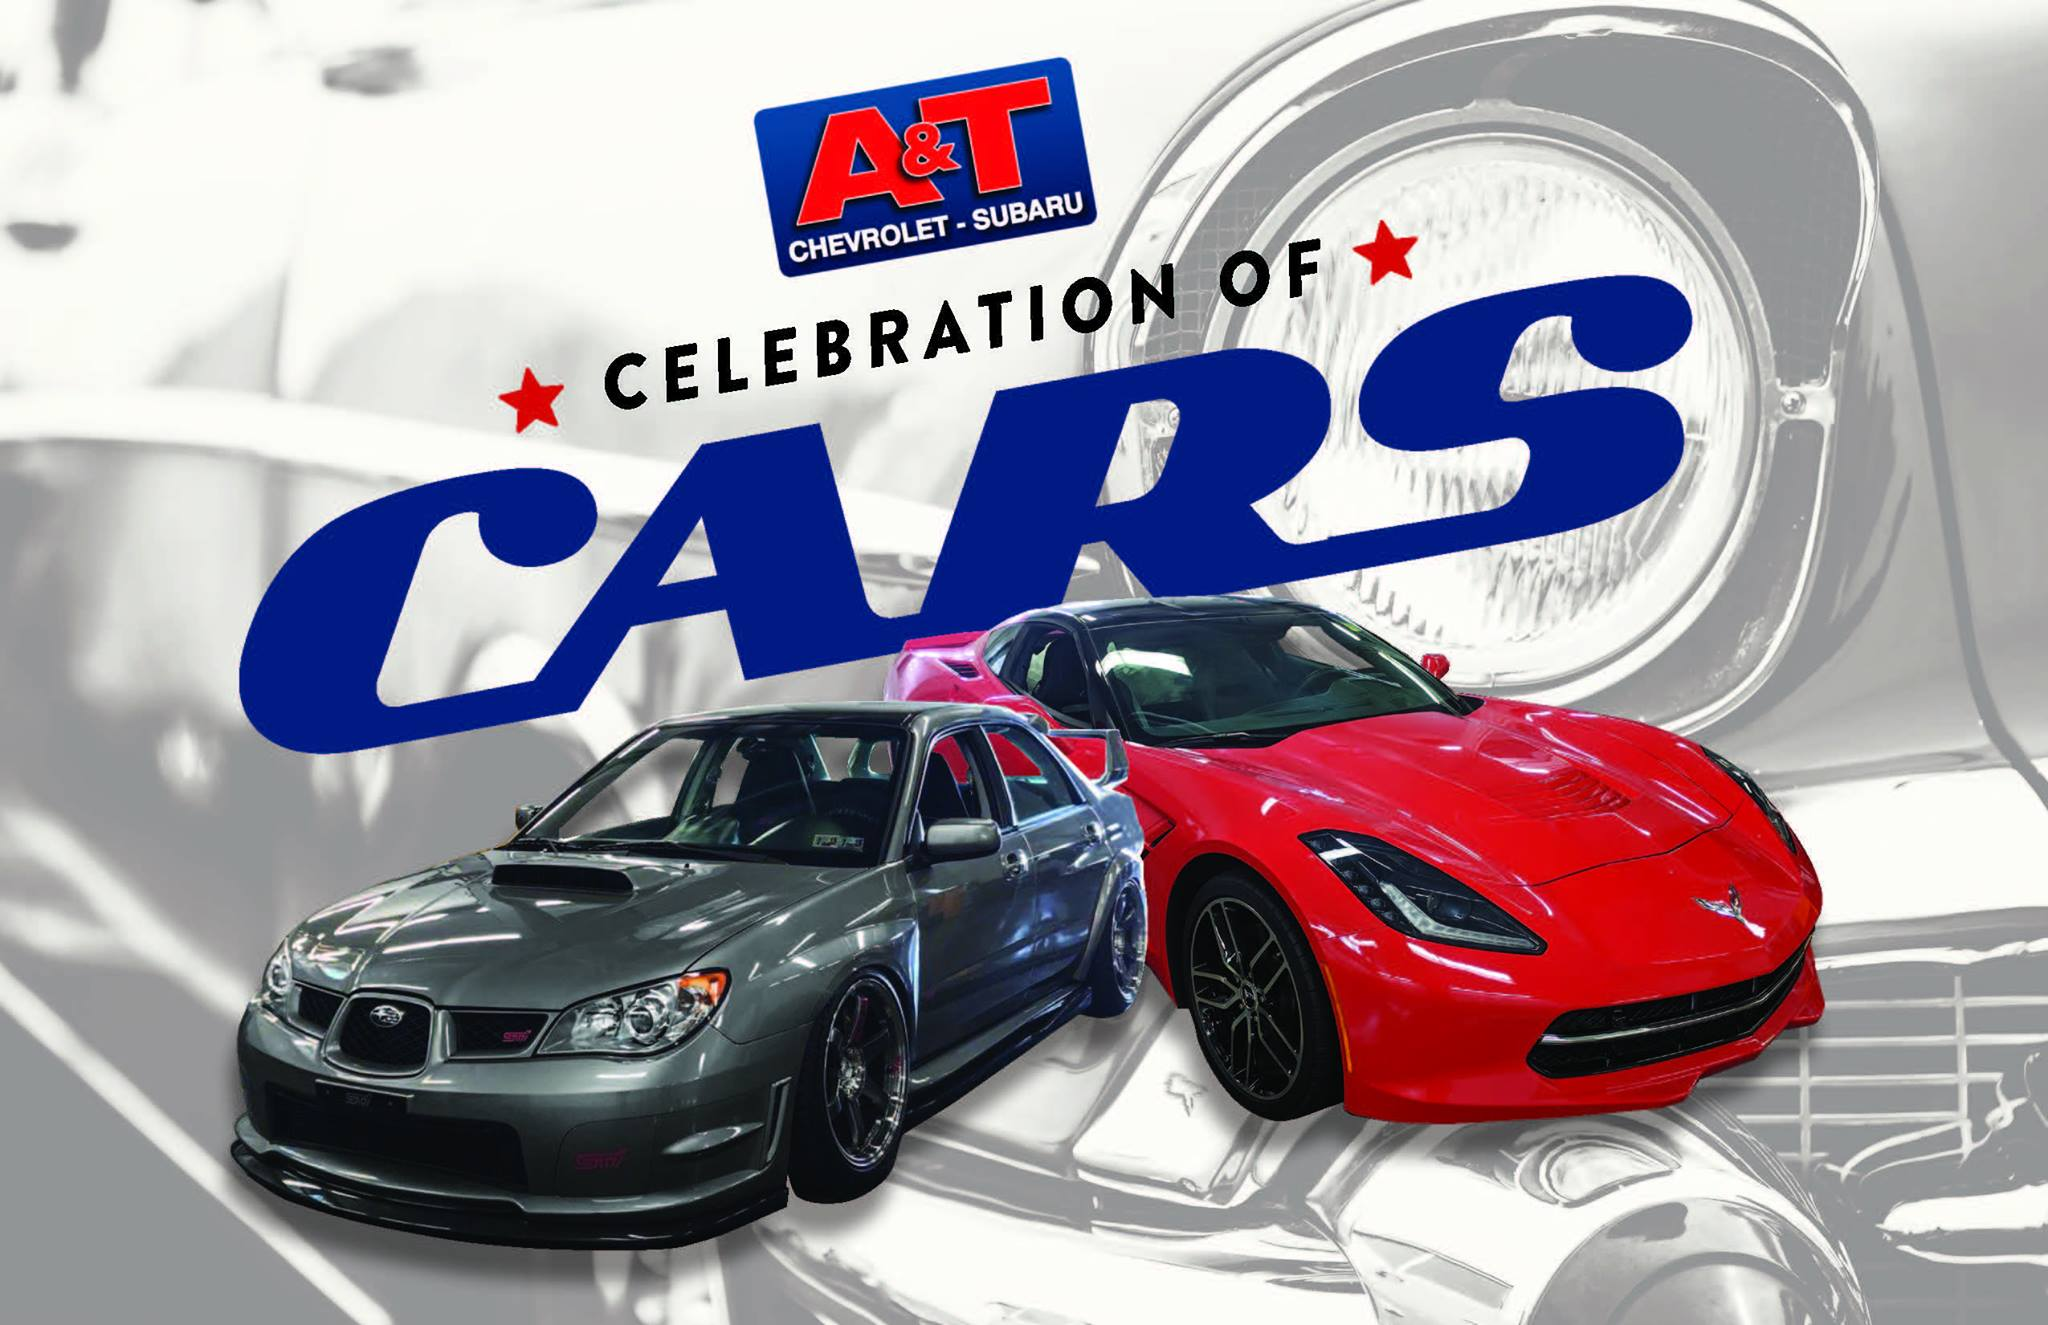 A&T CELEBRATION OF CARS - Sunday @ A&T Chevrolet